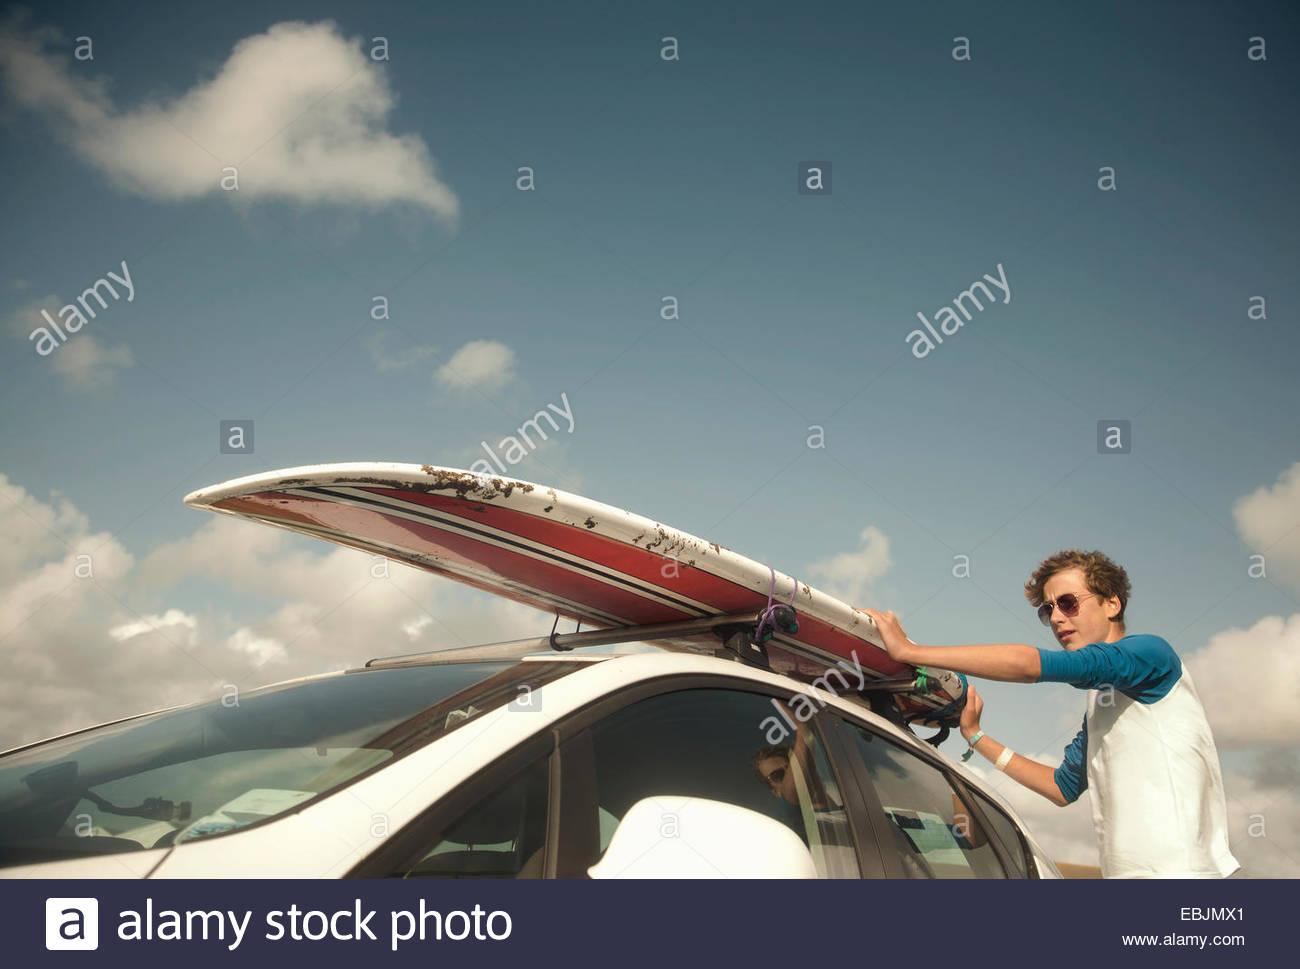 Teenage boy putting surfboard on top of car - Stock Image